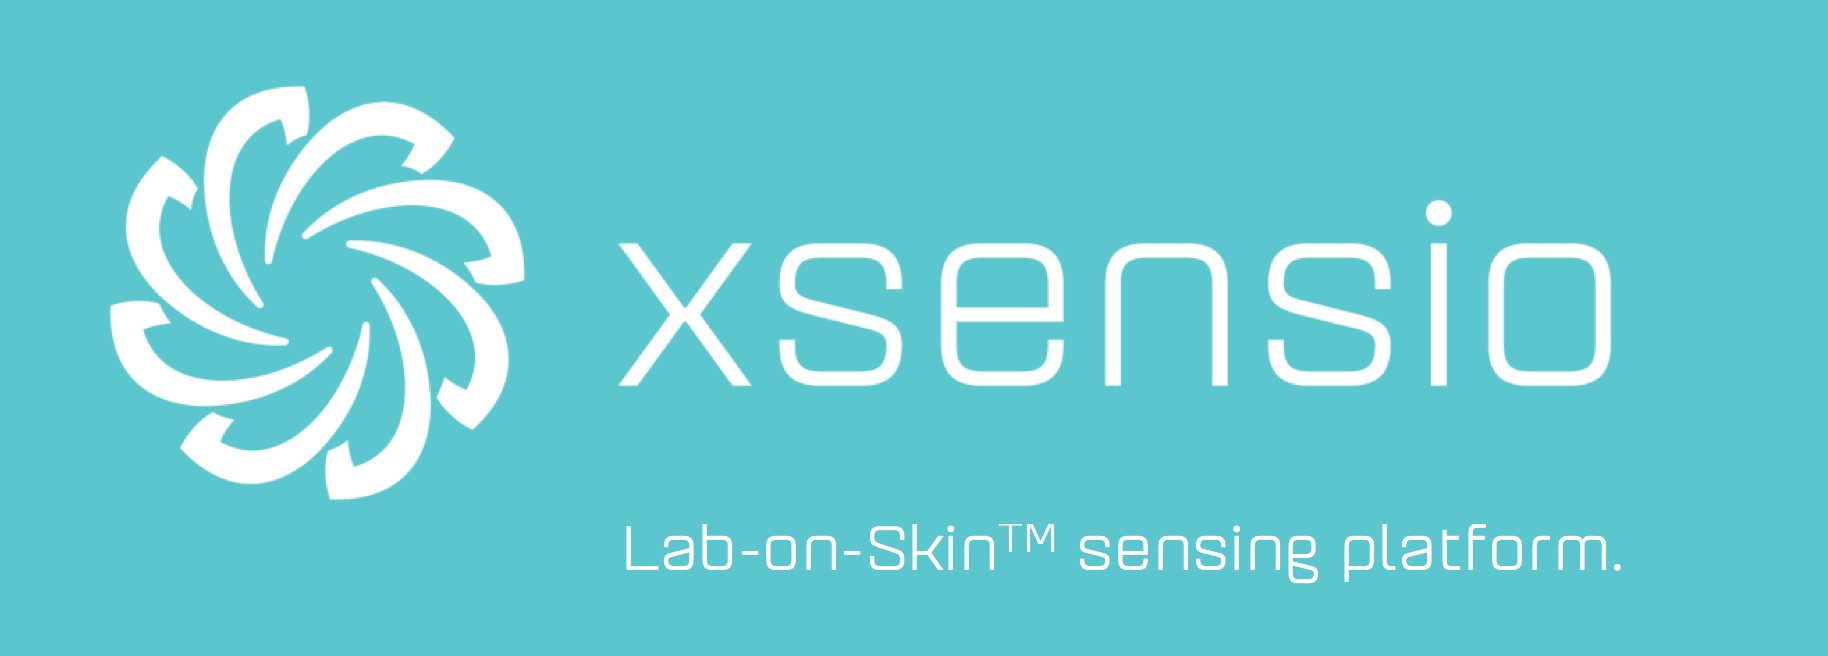 Xsensio logo